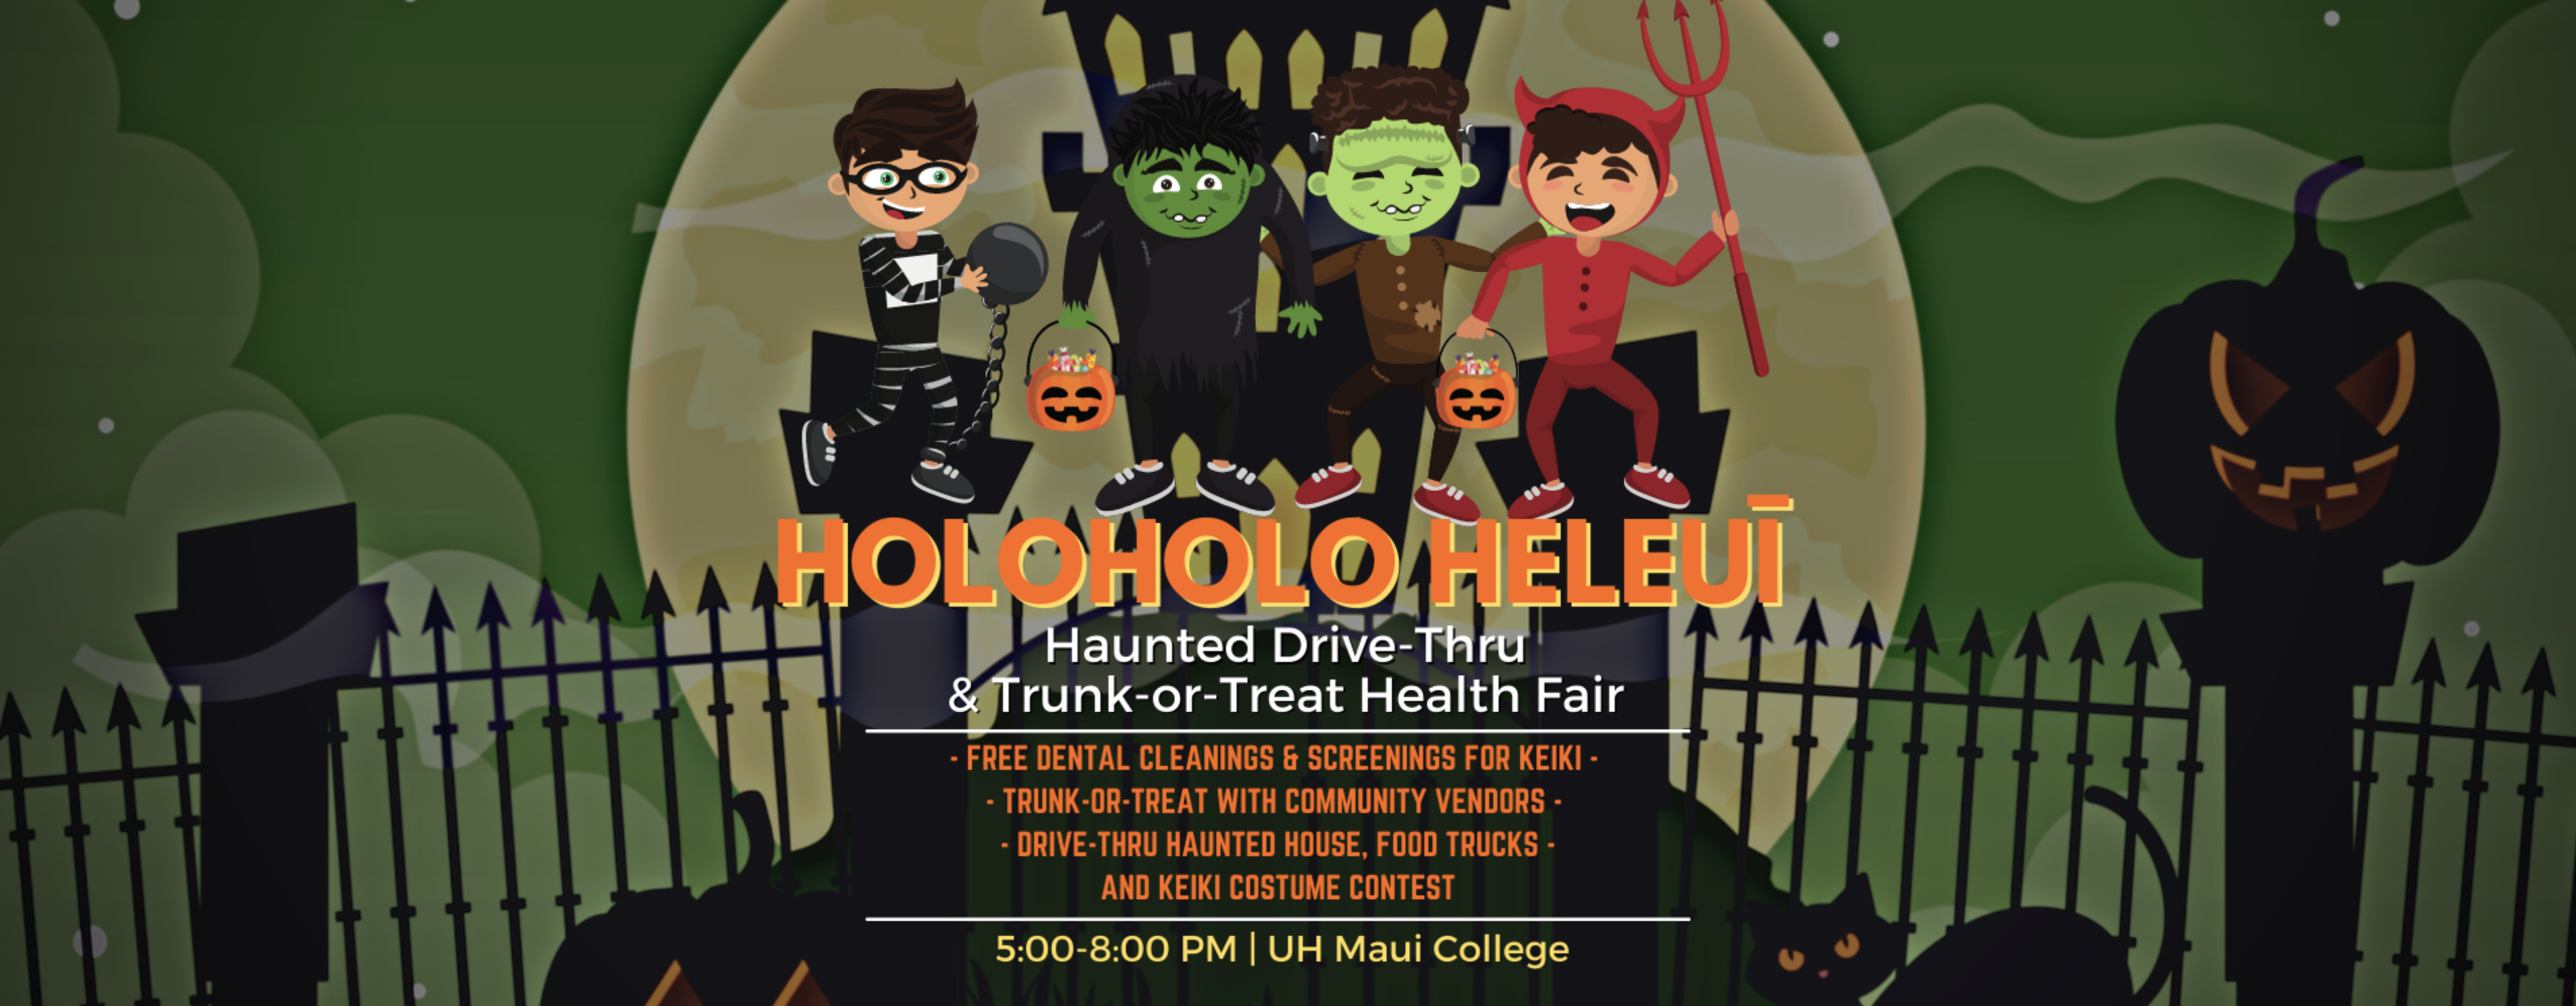 Hui No Ke Ola Pono to Host Haunted Drive-Through and Health Fair at UHMC